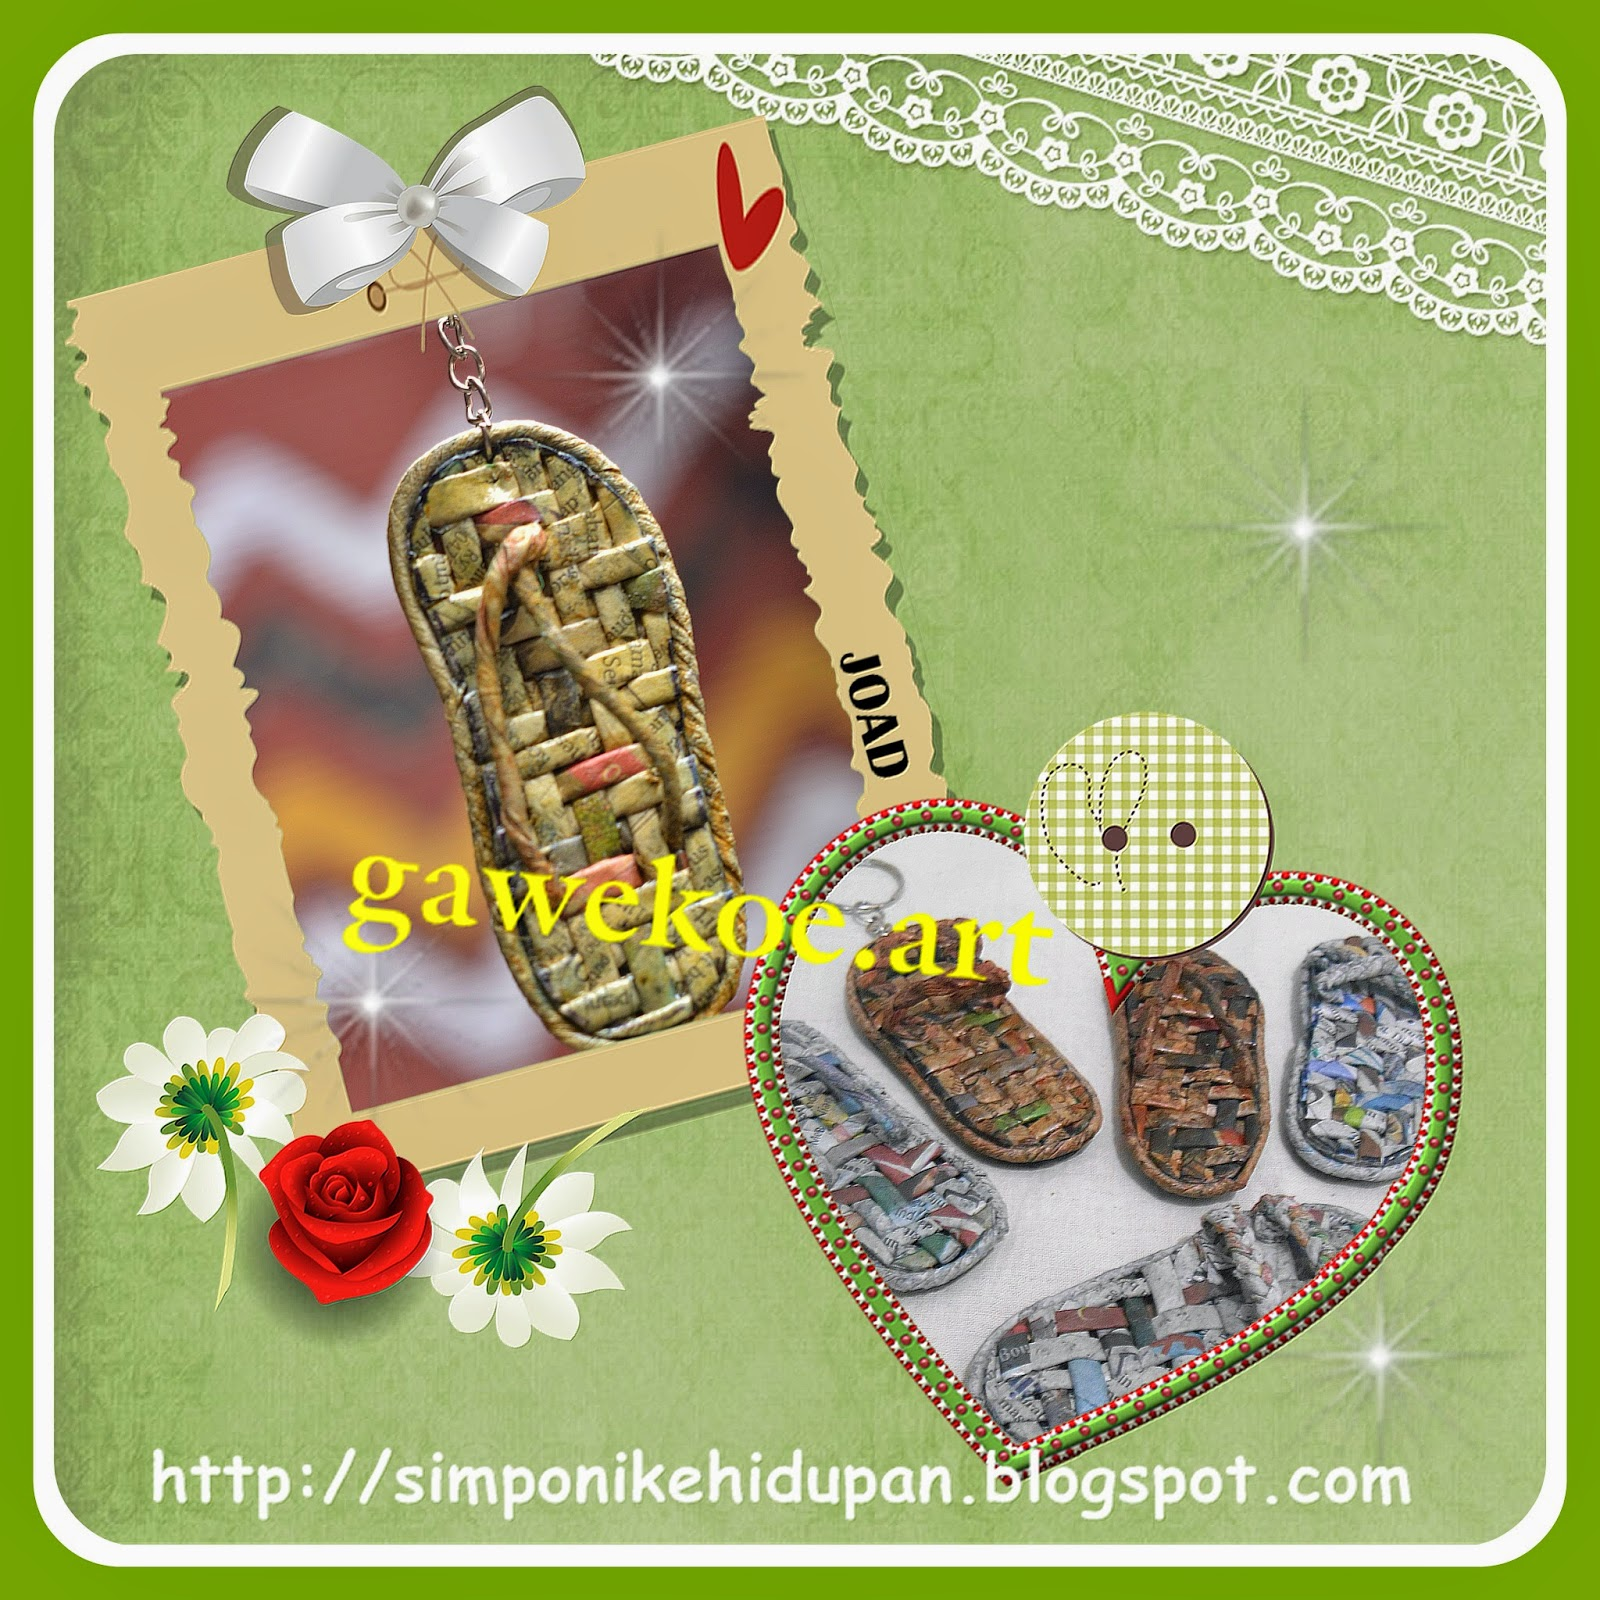 kerajinan tangan dari kertas koran ;souvenir gantungan kunci